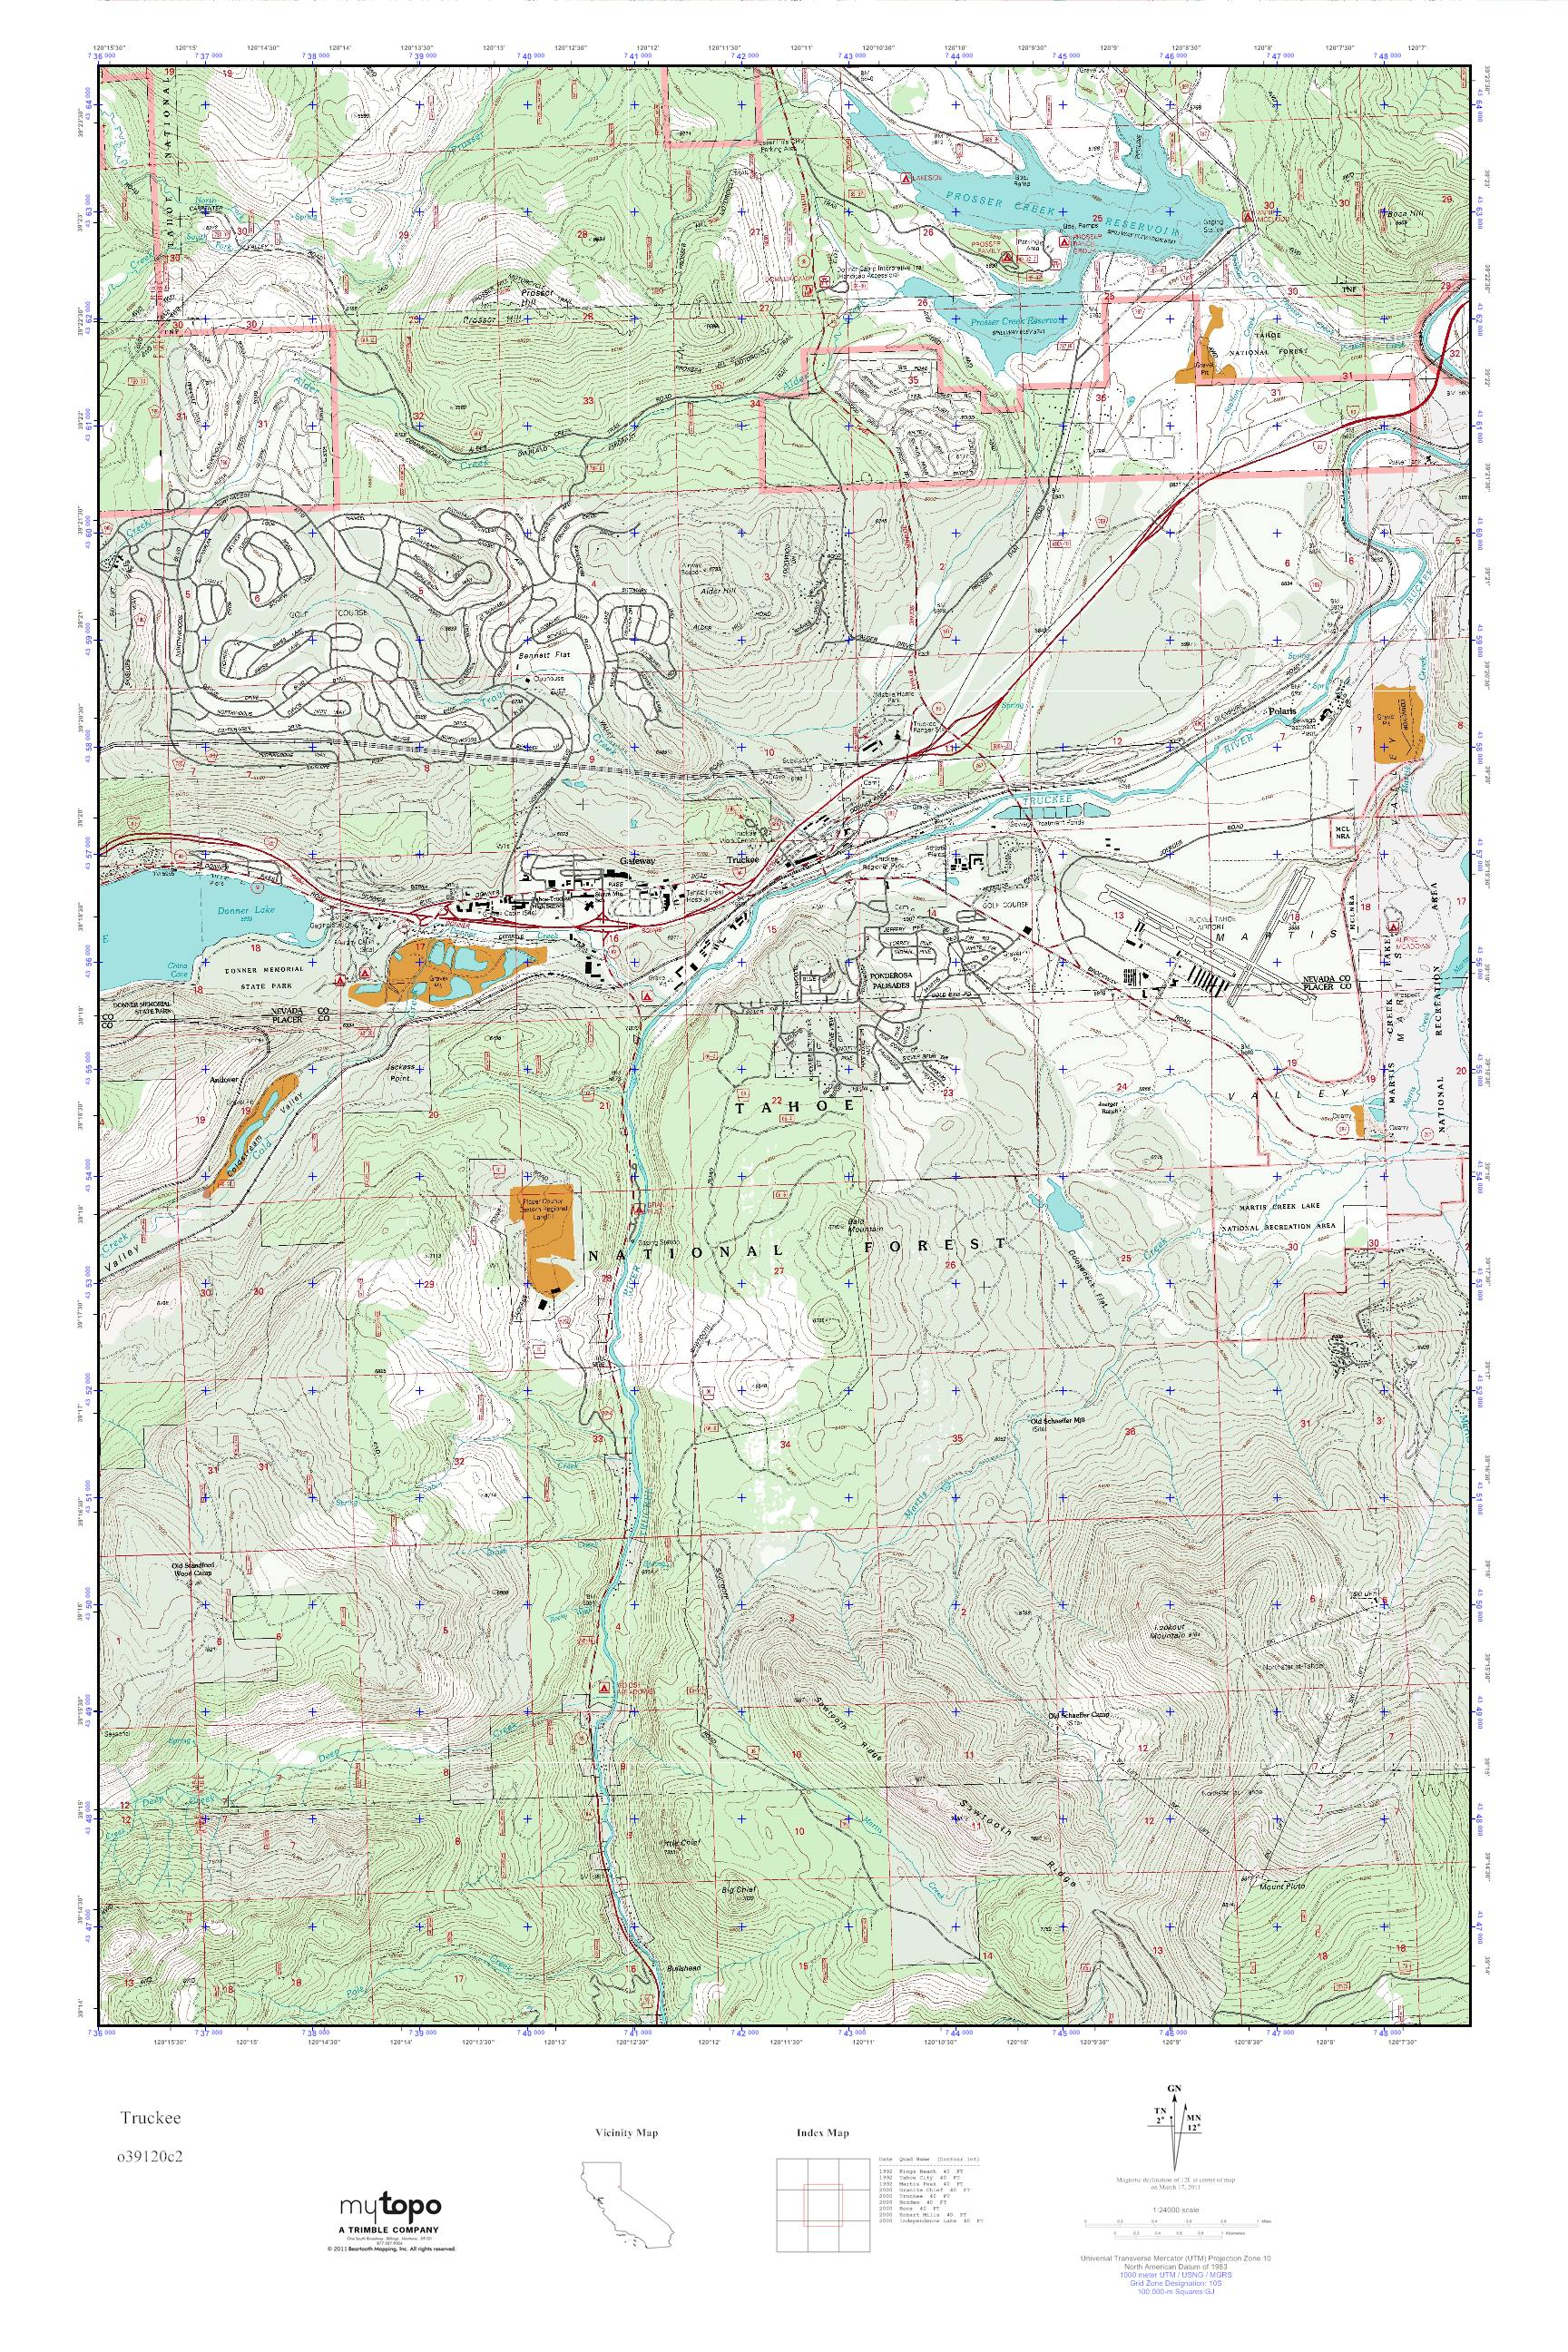 Mytopo Truckee California Usgs Quad Topo Map